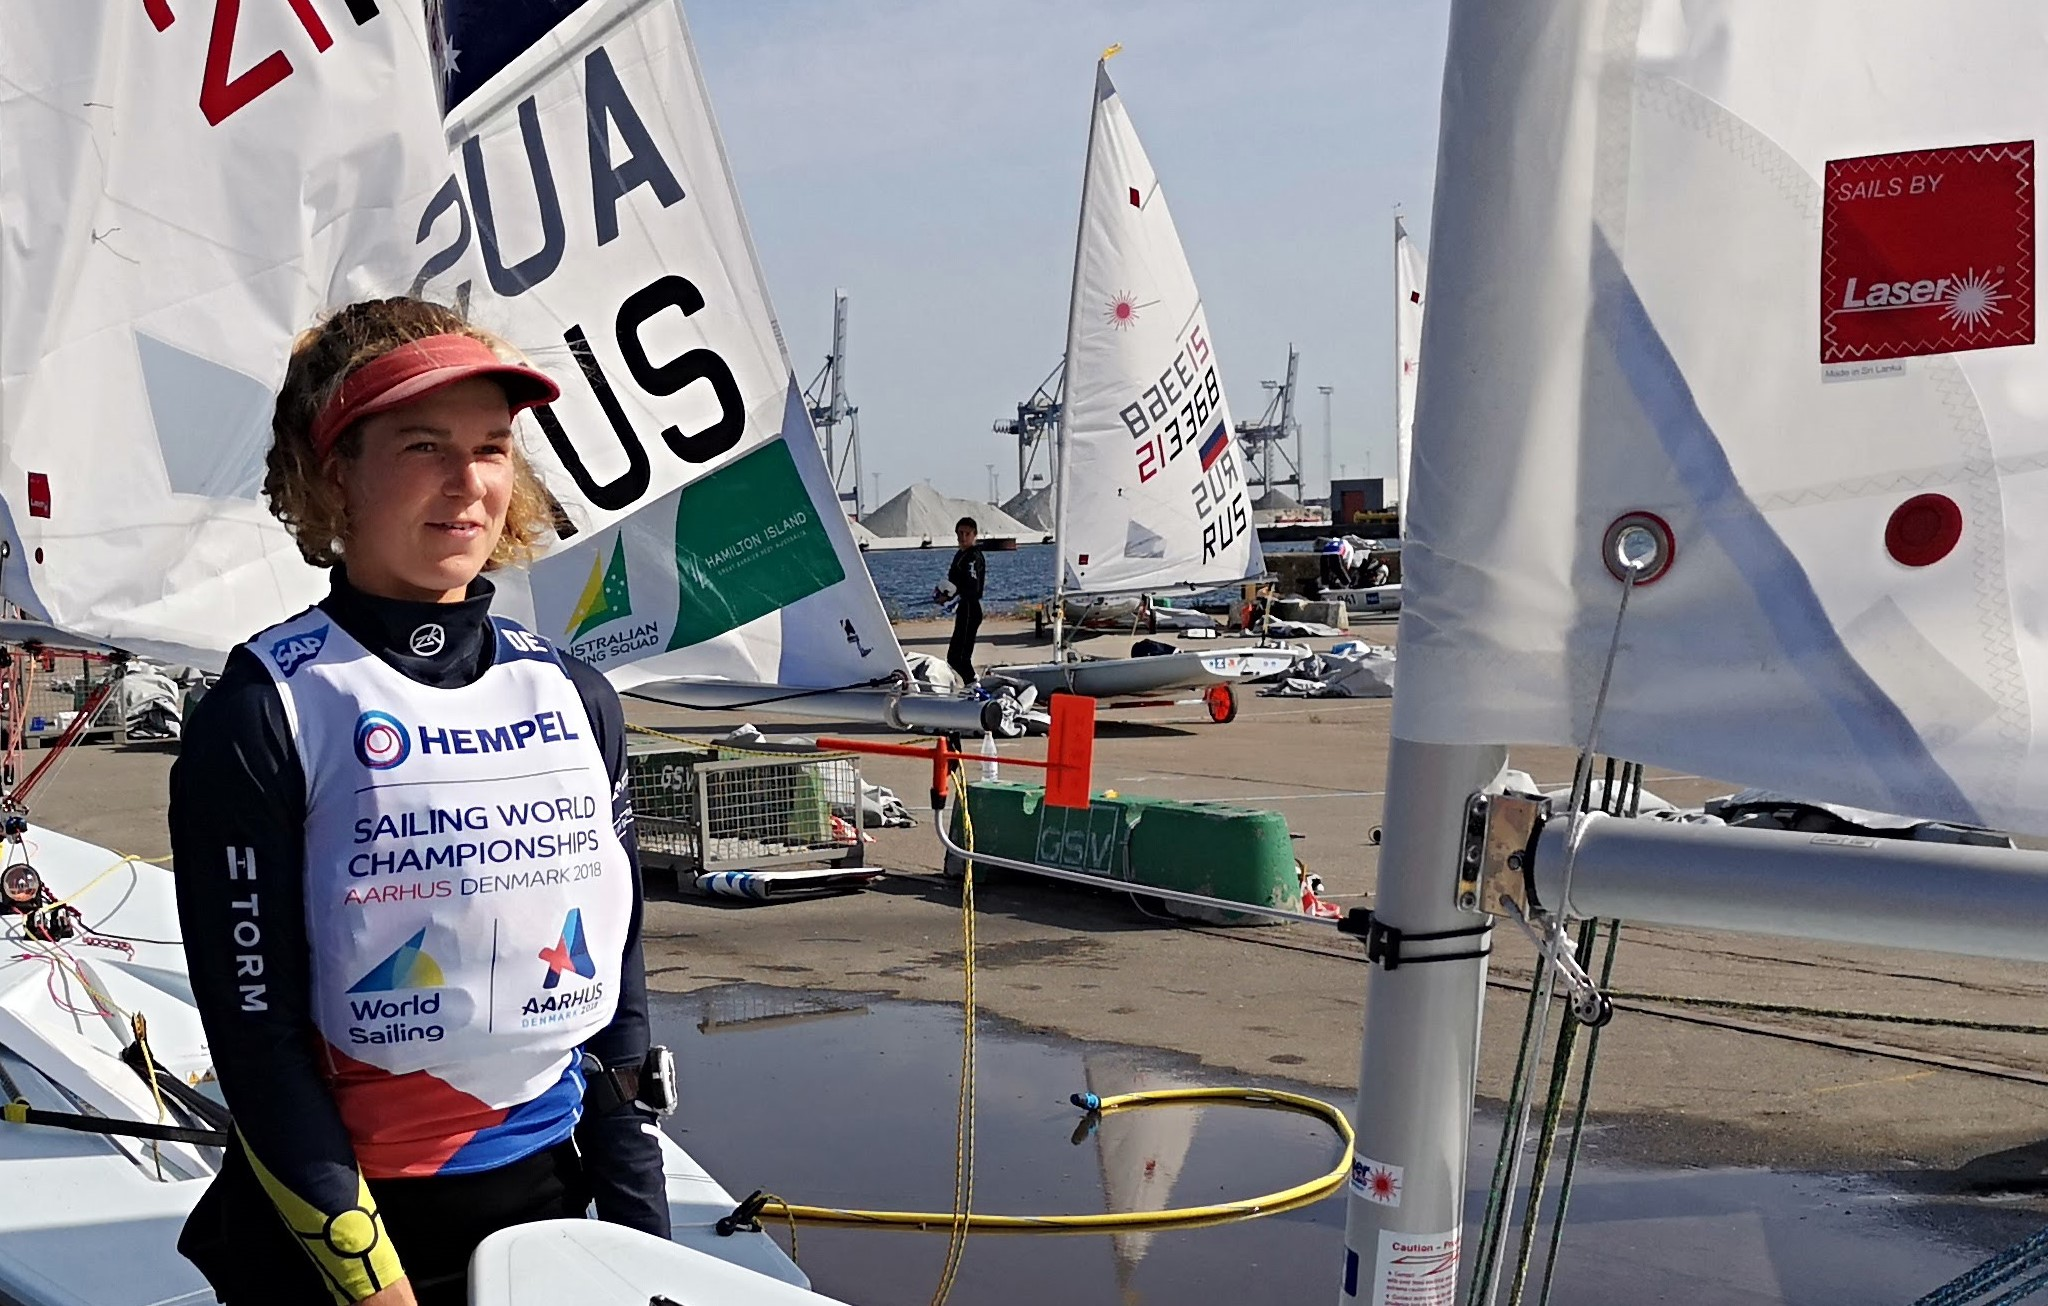 Den 20-årige Laser Radial-sejler fra Kaløvig Bådelaug, Anna Munch, har haft et formidabelt 2018. Hende mor var også et kæmpe talent i 470er. Foto: Troels Lykke